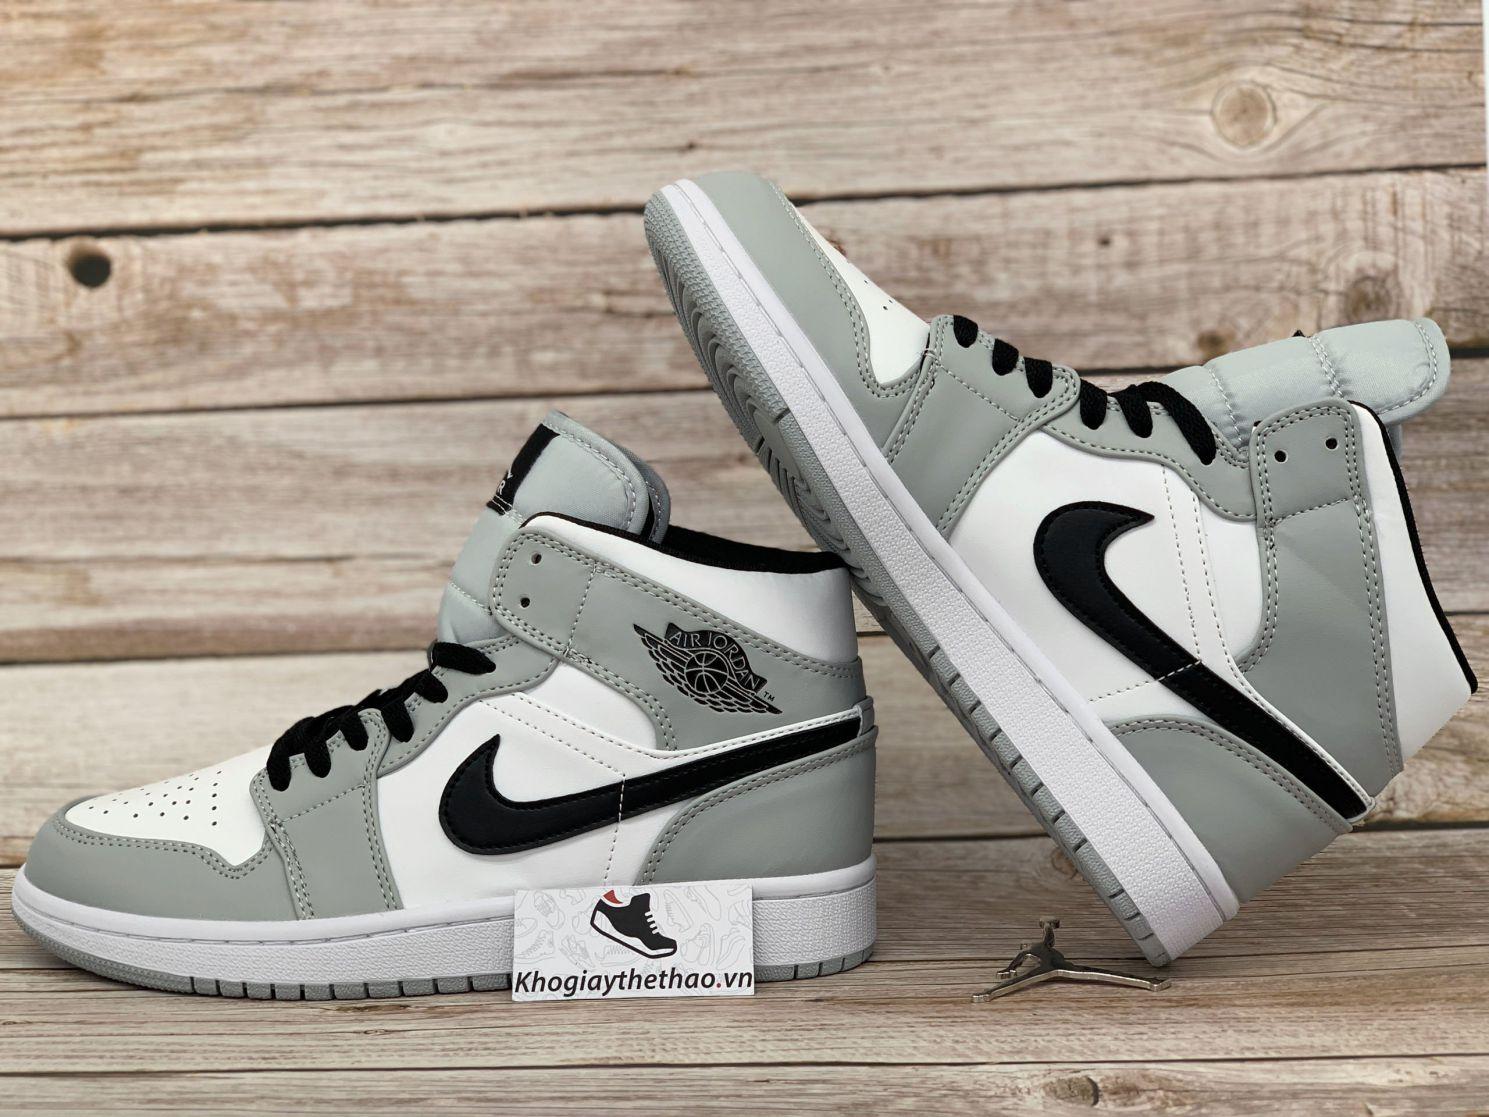 Giày Nike Air Jordan 1 Mid Light Smoke Grey rep 11